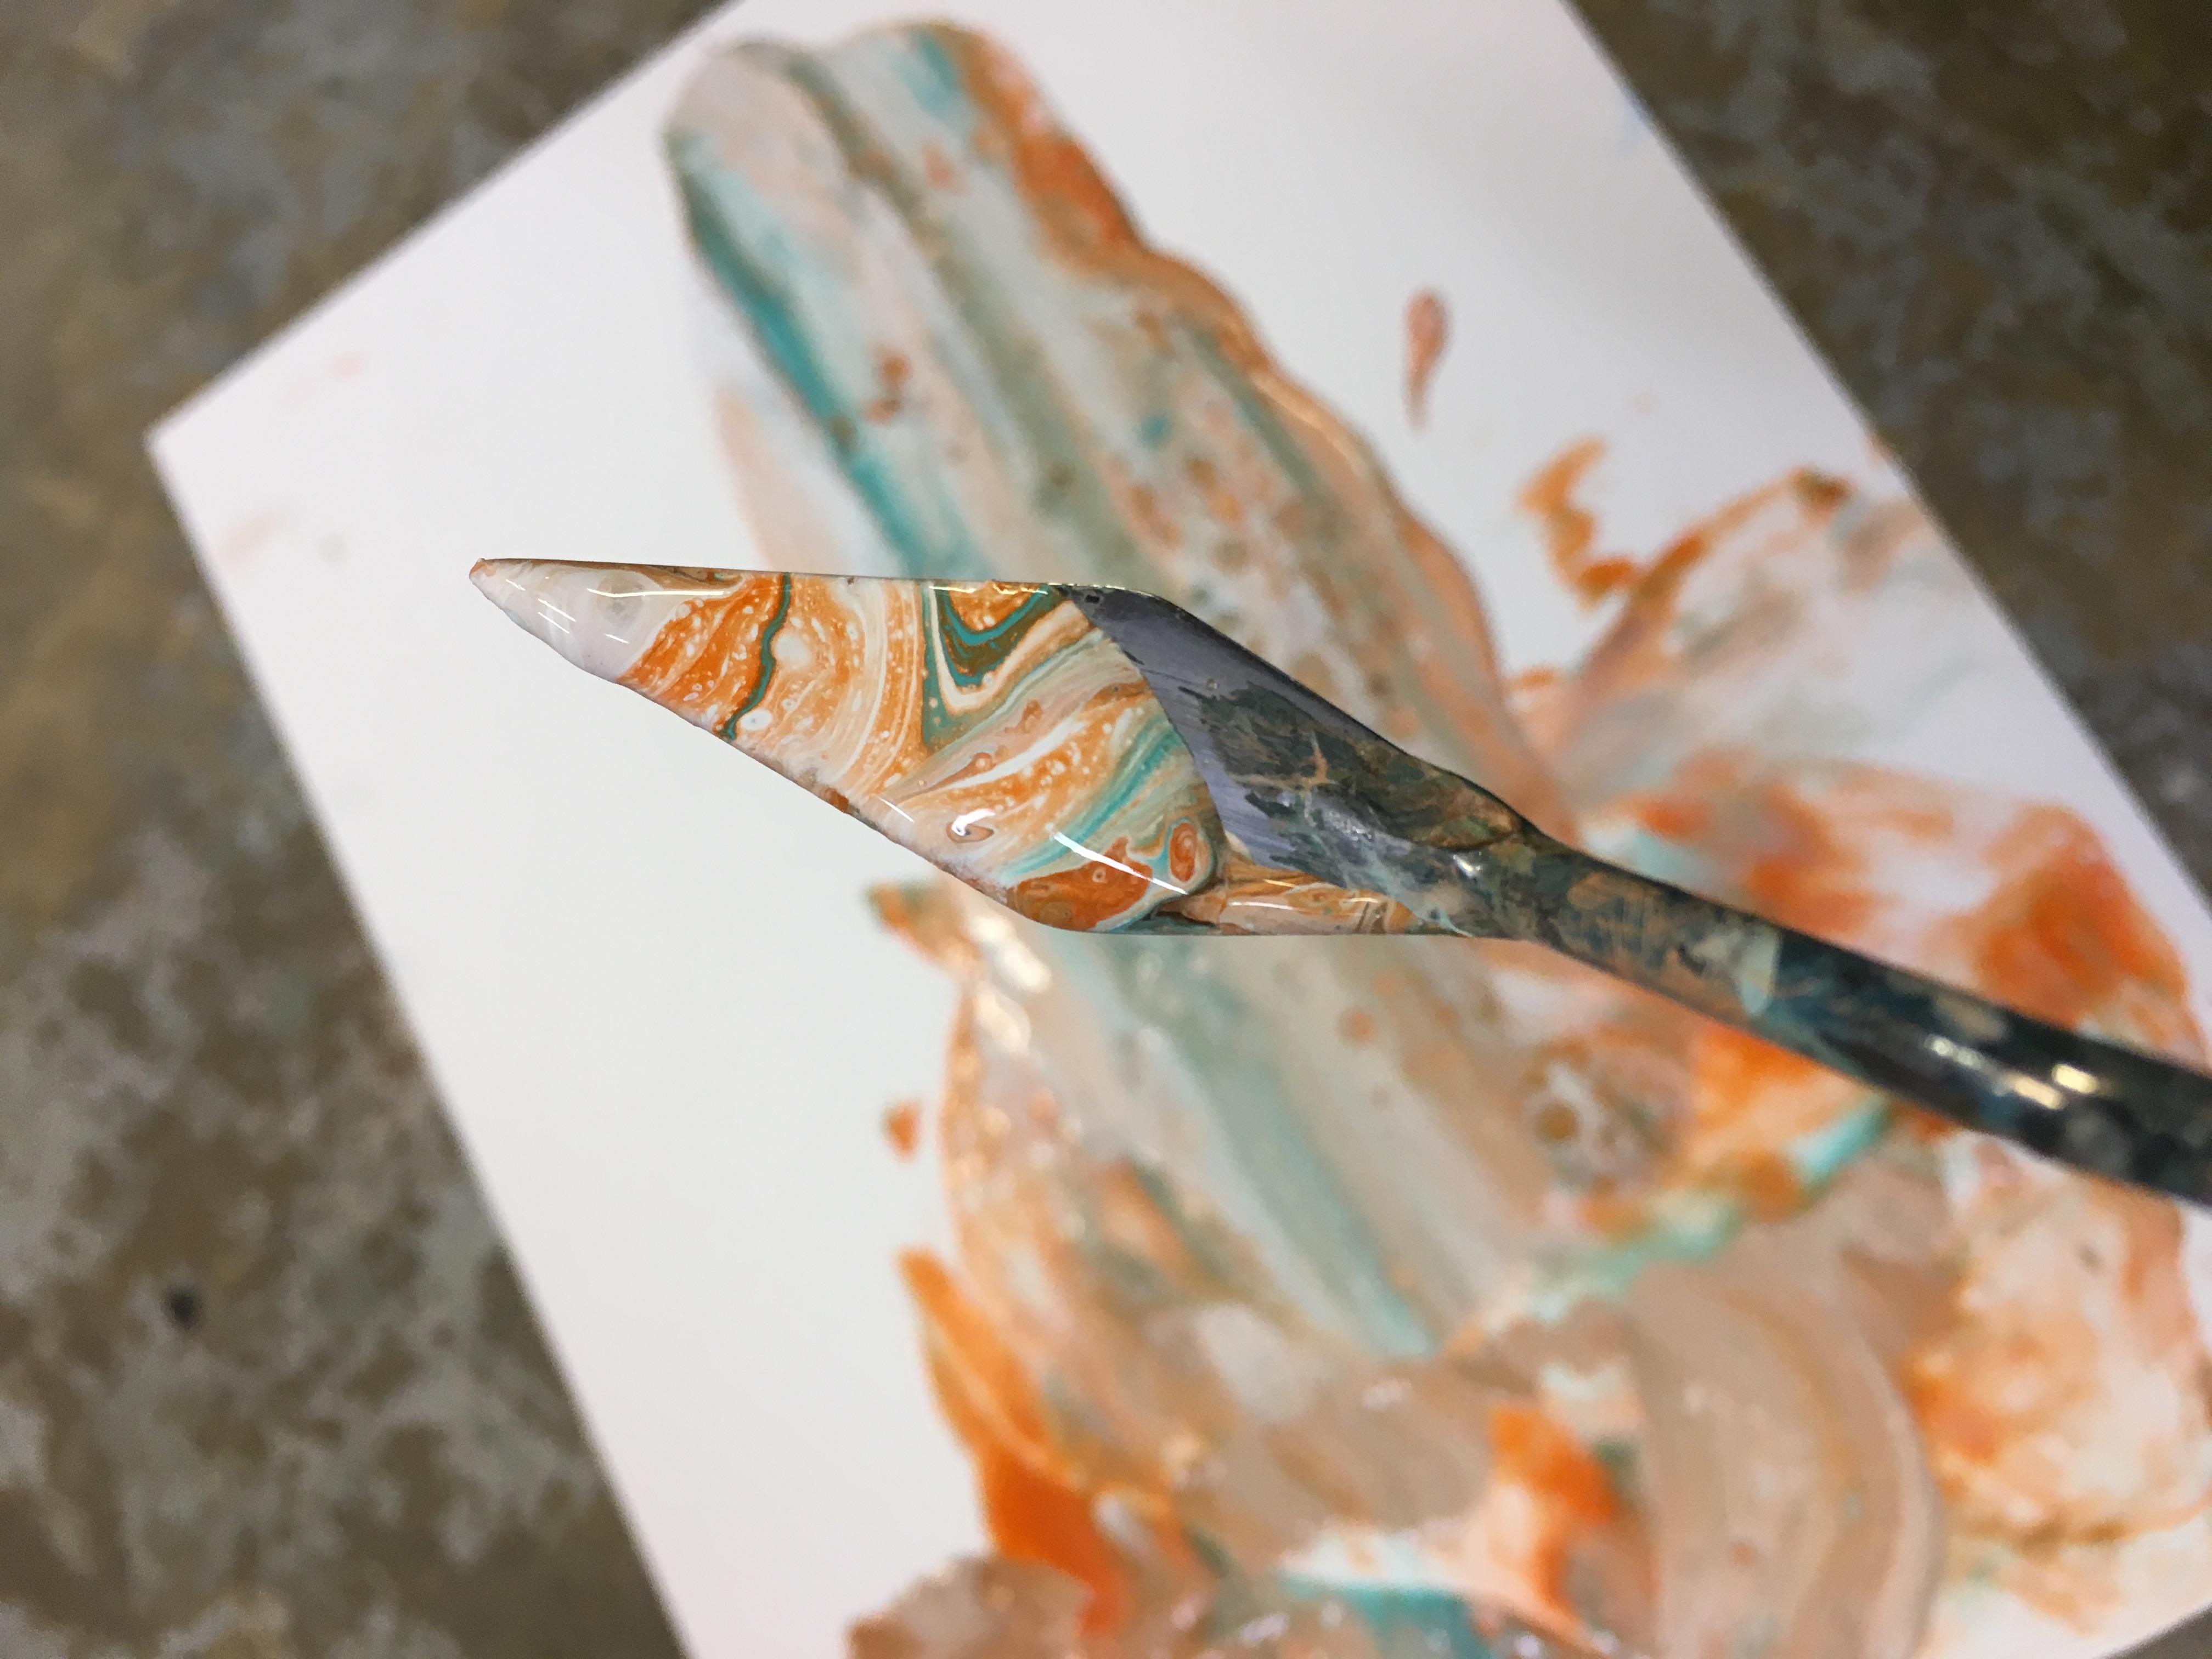 Behind the scenes, painting detail by Washington State painter, Jennifer Preston Chushcoff